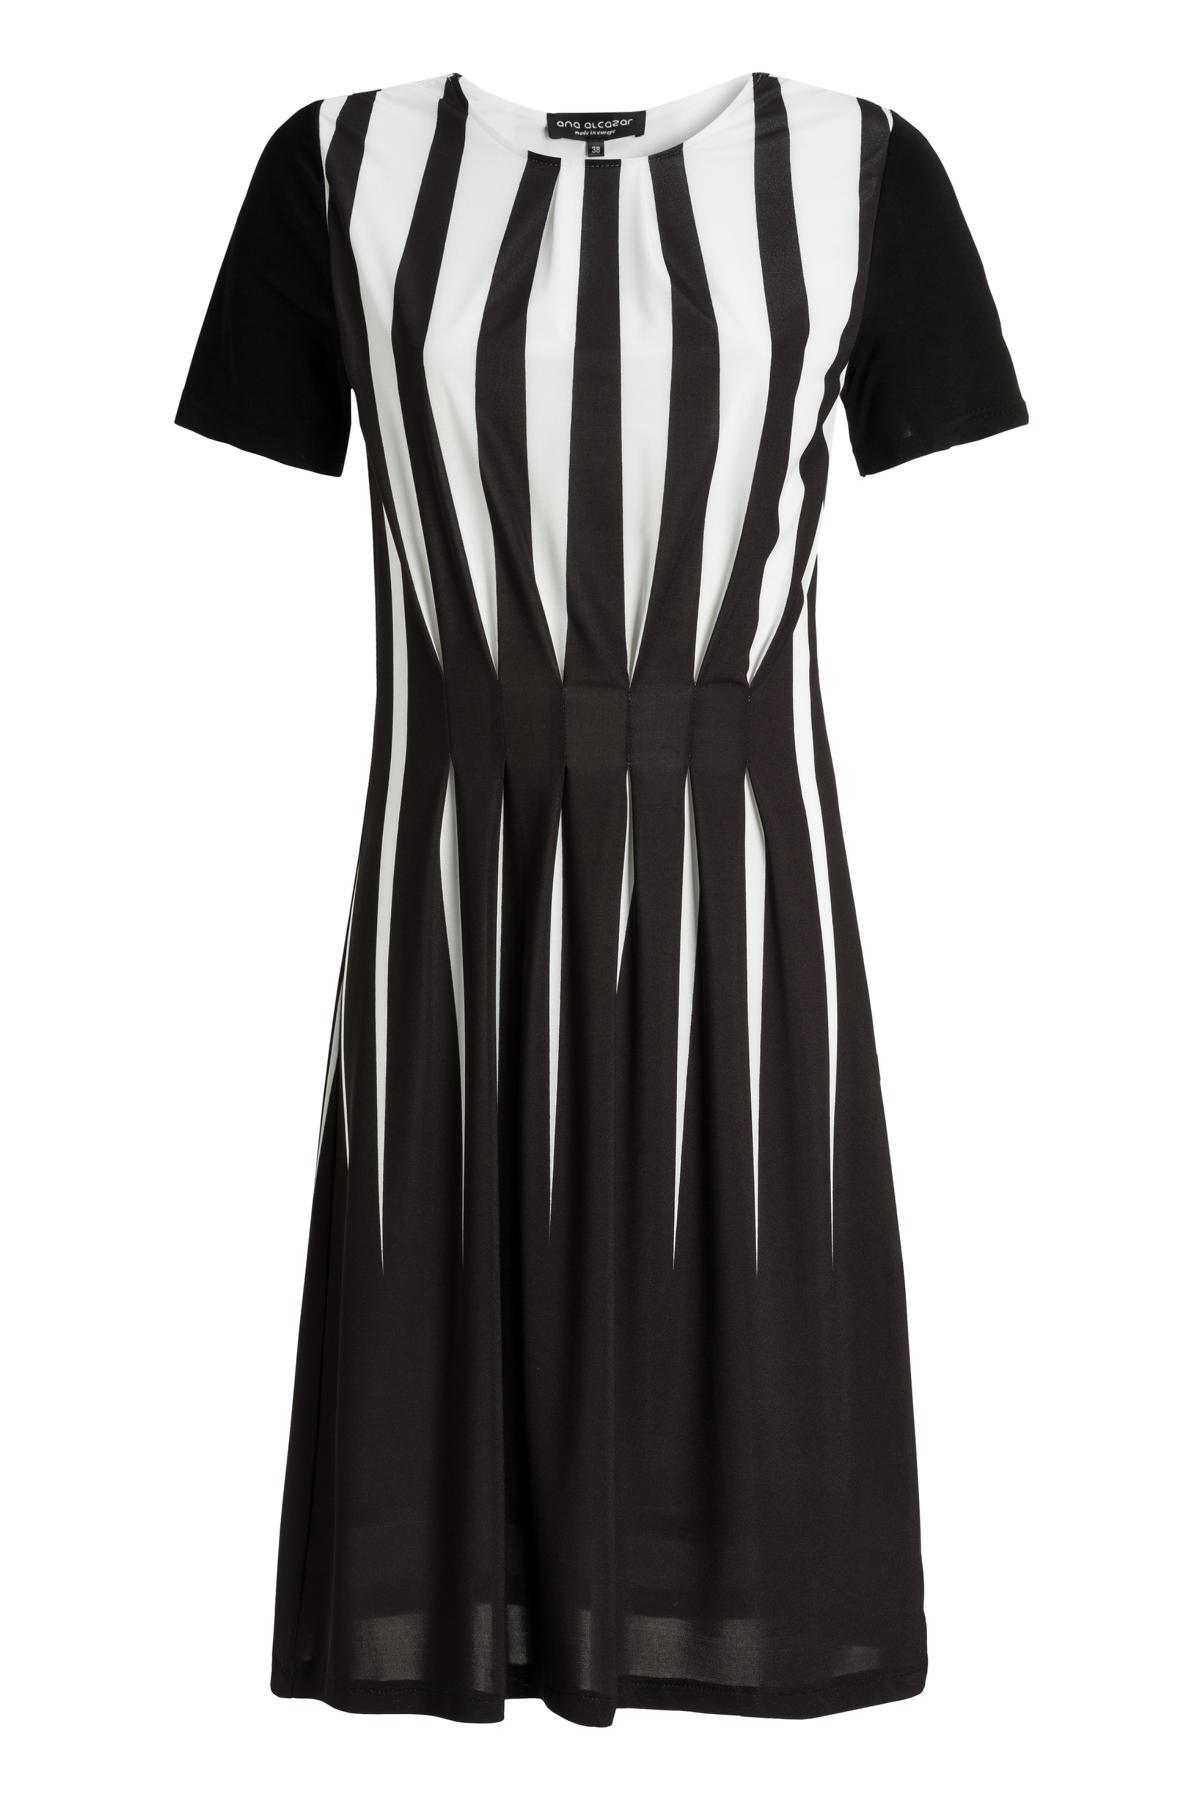 Ana Alcazar Stripe Dress Marisea